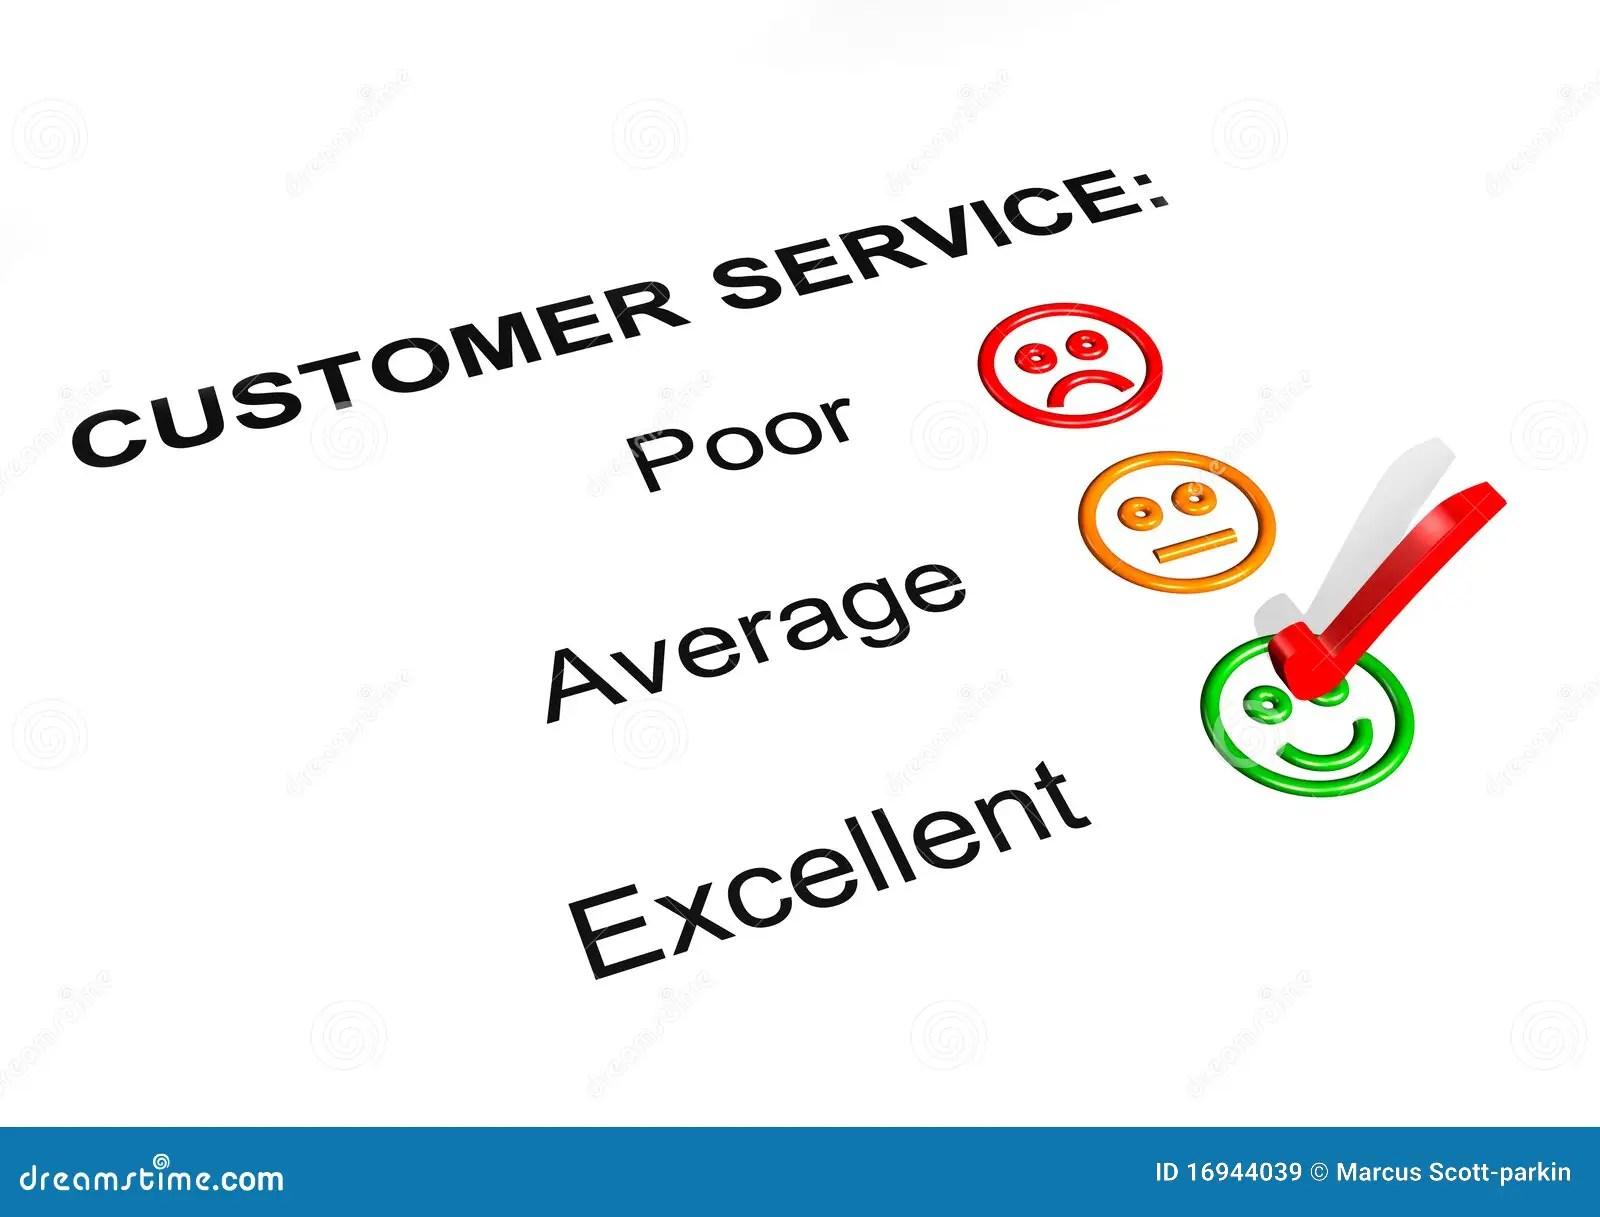 Customer Service Excellent Rating Stock Illustration